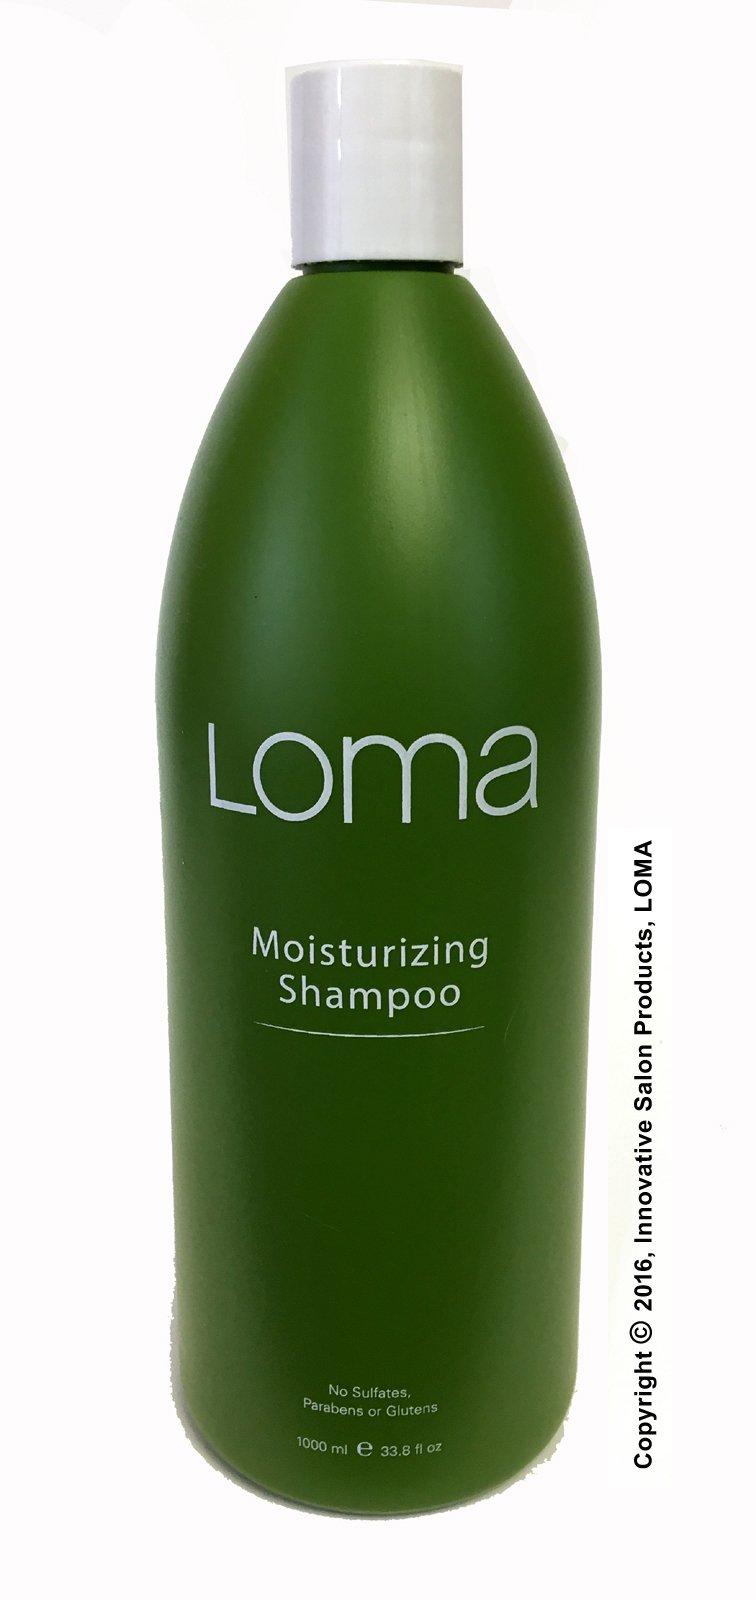 Loma Moisturizing Shampoo, 33.8 Fl Oz by Loma Hair Care